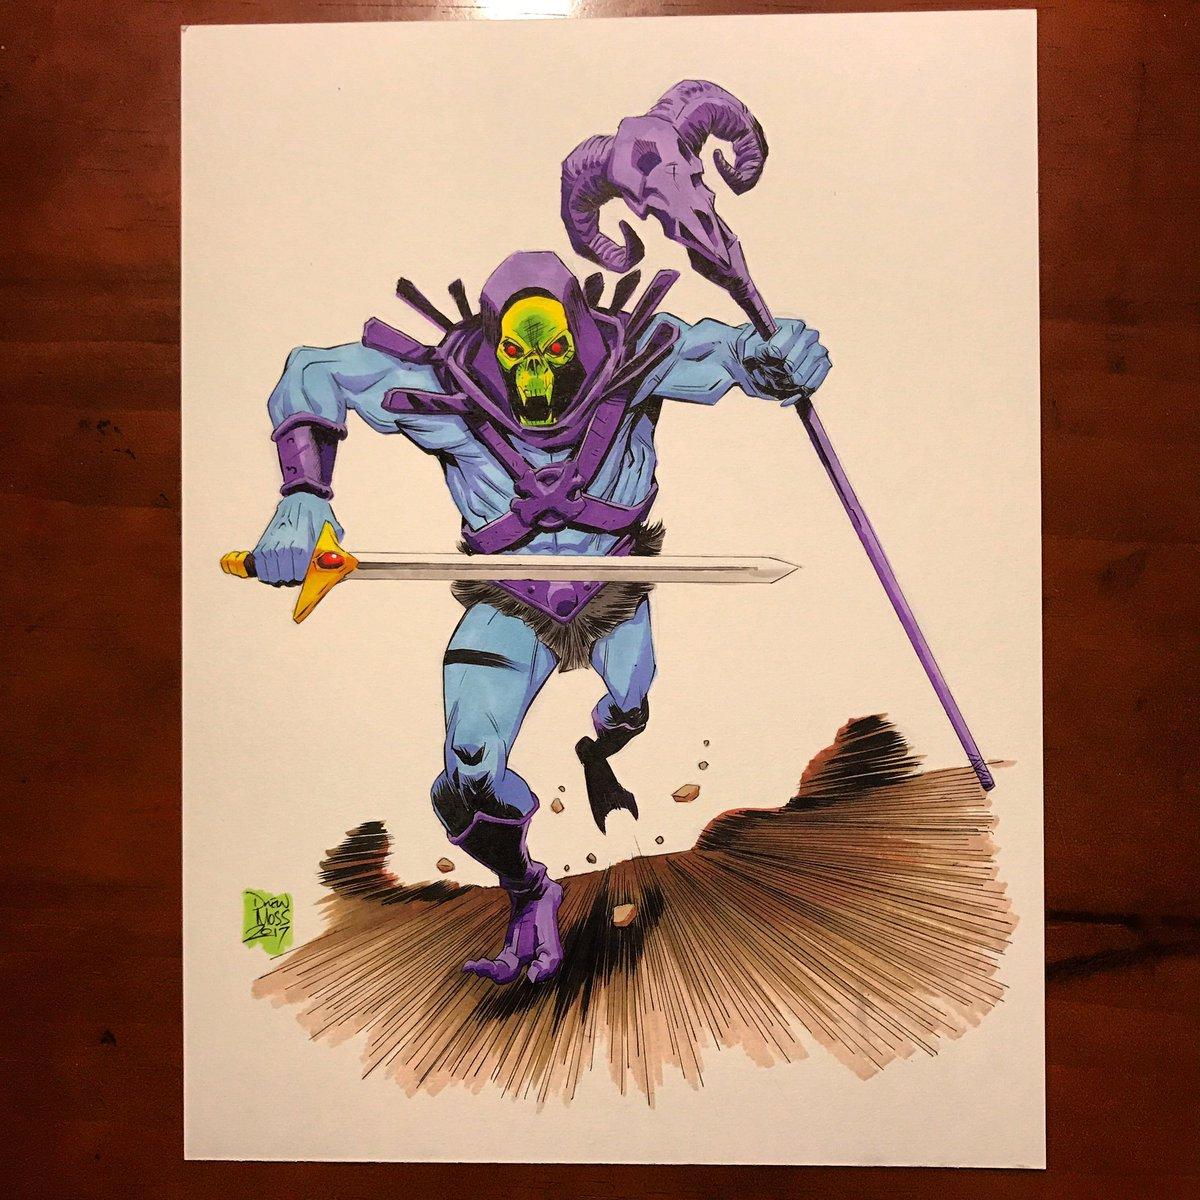 #skeletor #motu #mattel #heman #commission #comics so much fun<br>http://pic.twitter.com/Ko4G20jIgx